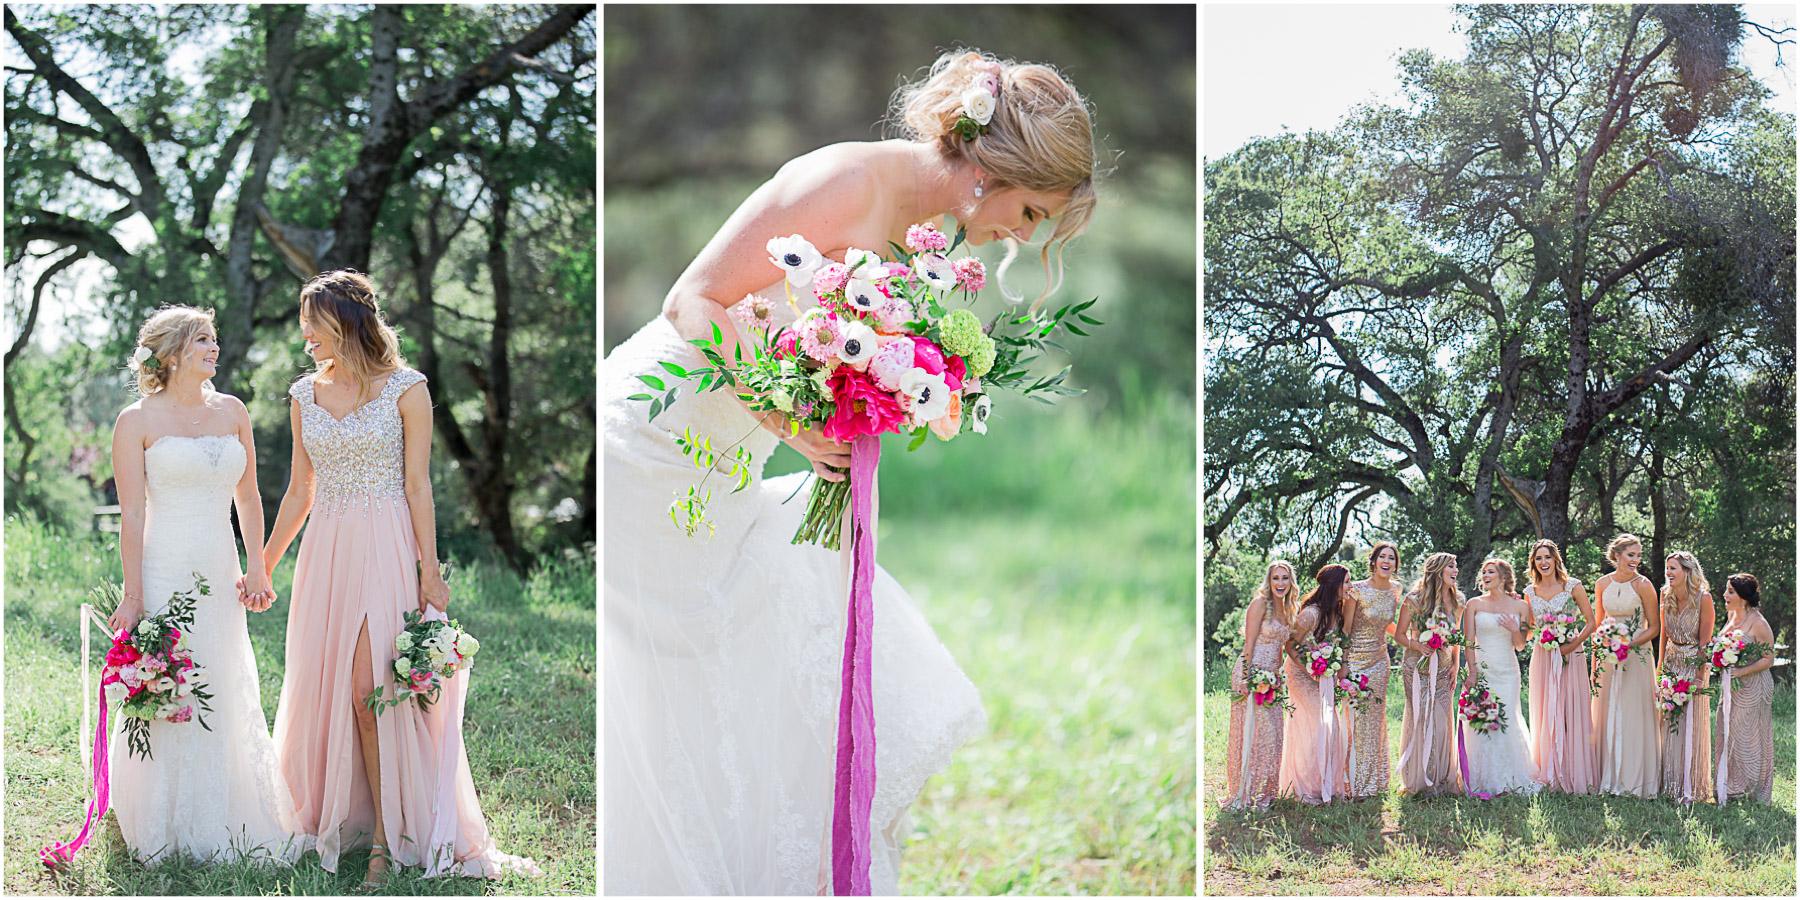 JennaBethPhotography-PSWedding-11.jpg